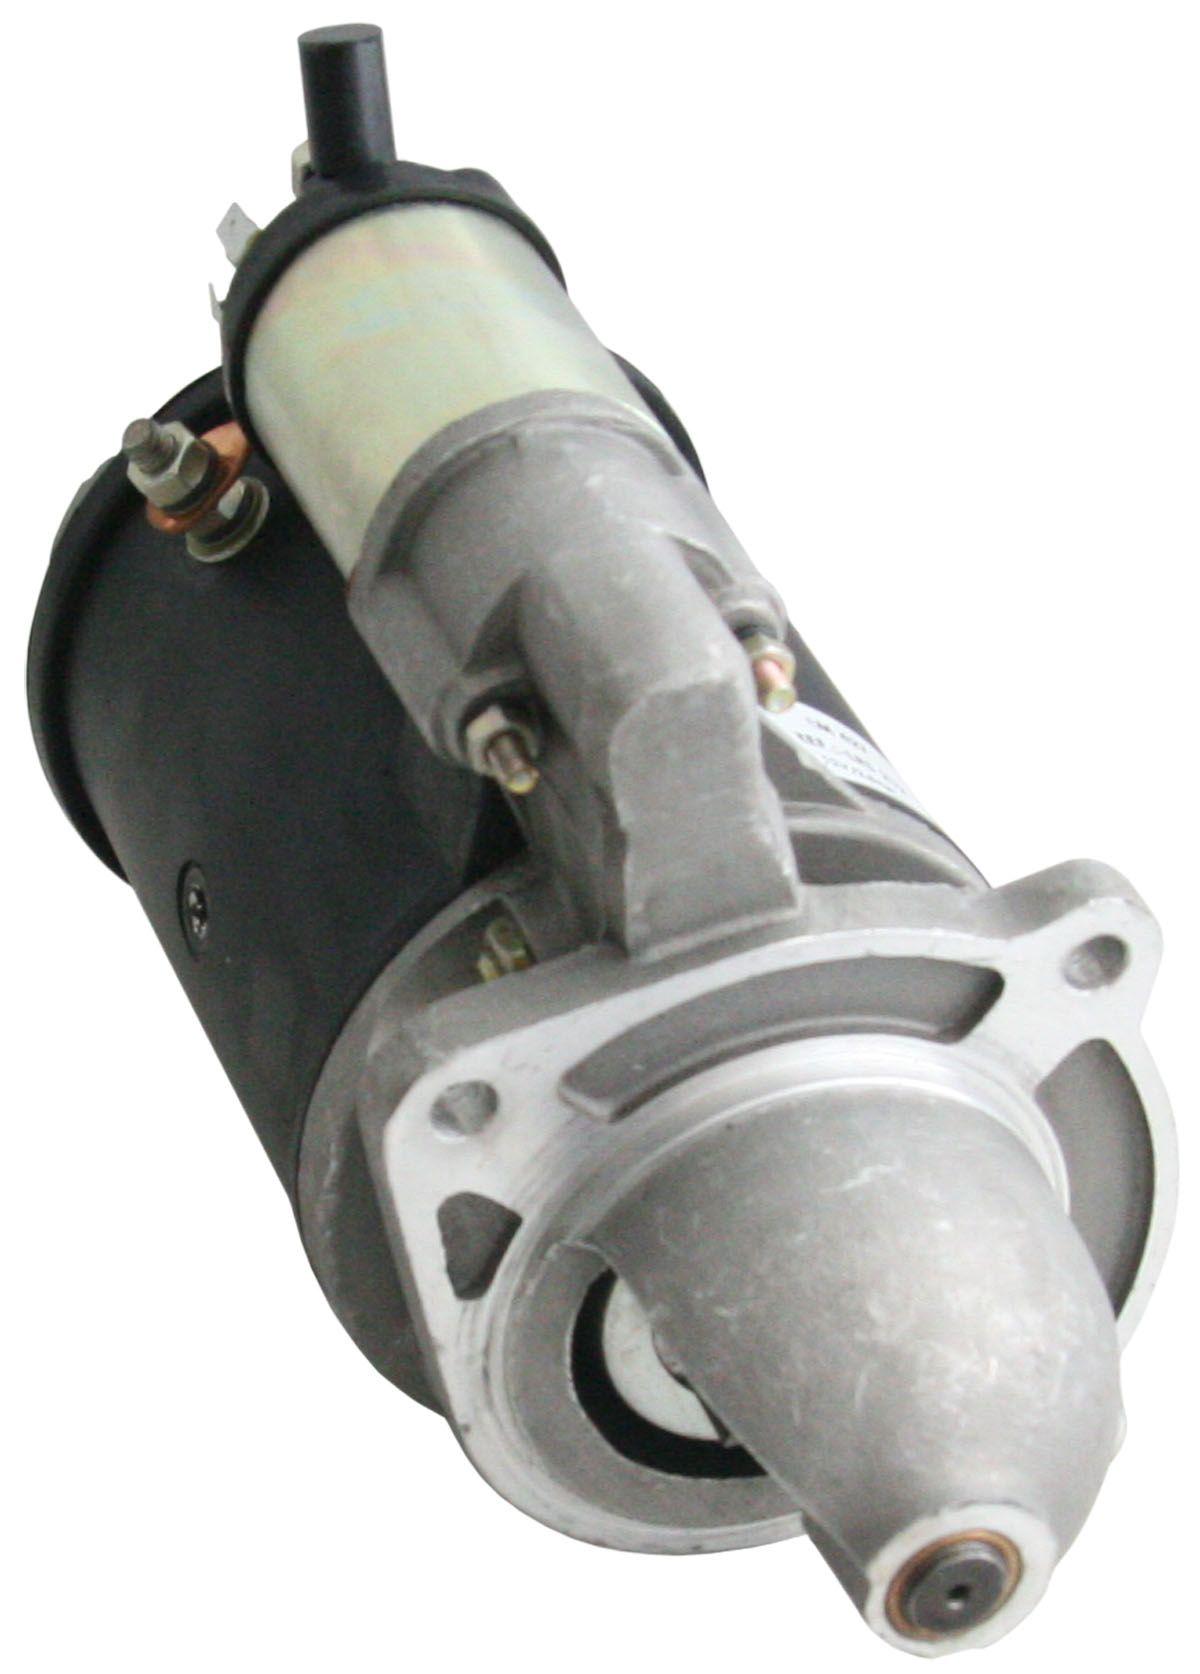 EMMARK FORDSON STARTER MOTOR - (26395LRS)